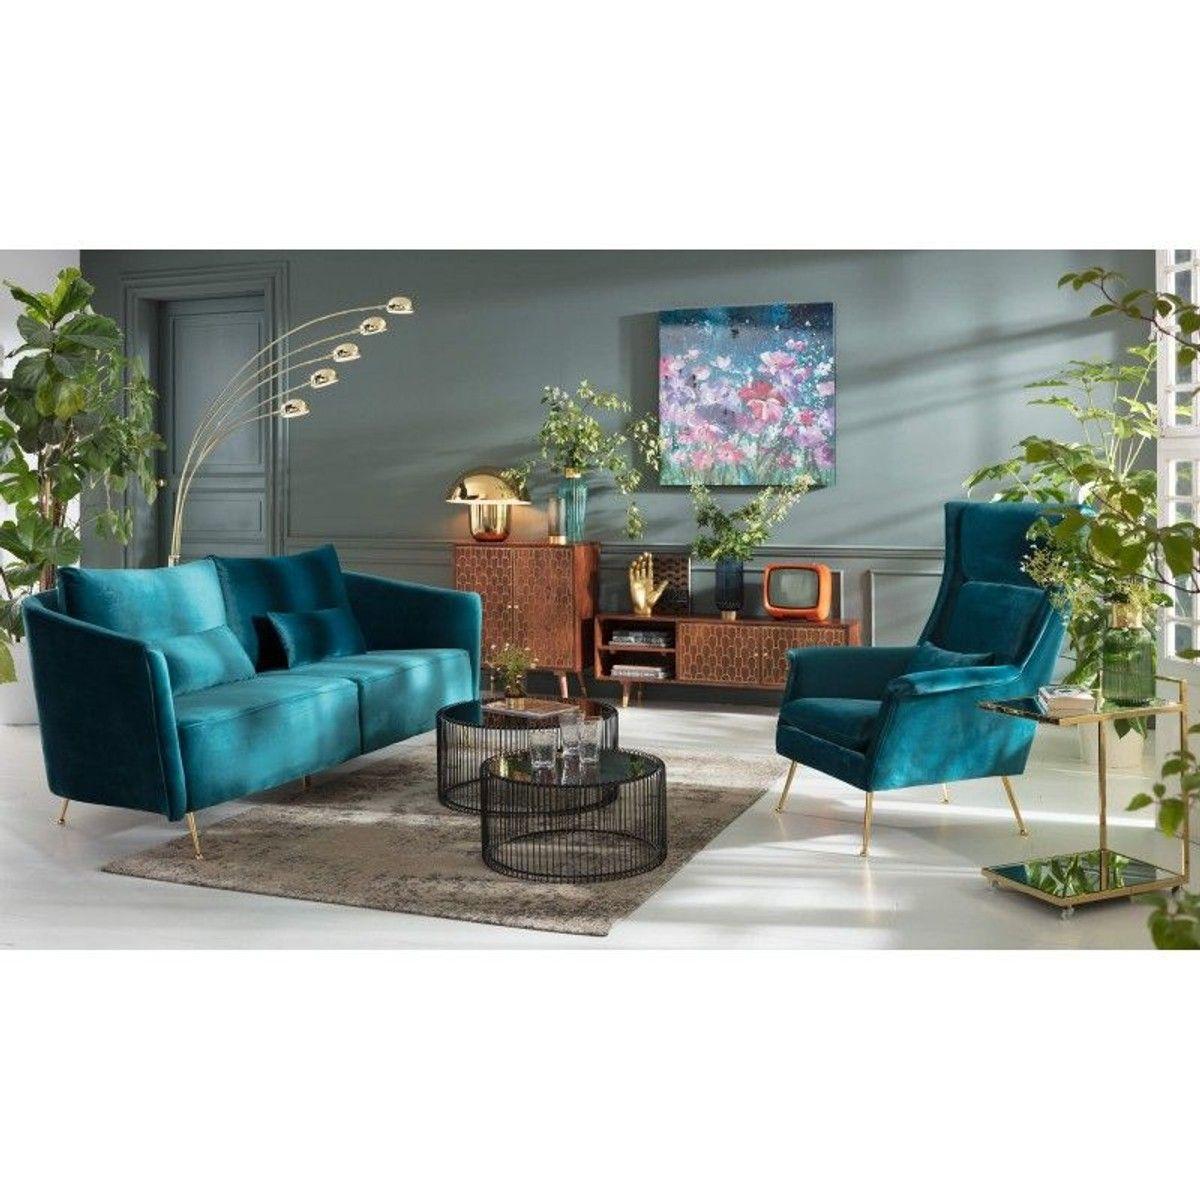 Fauteuil Vegas Forever Bleu-vert Kare Design - Taille : 1 ...